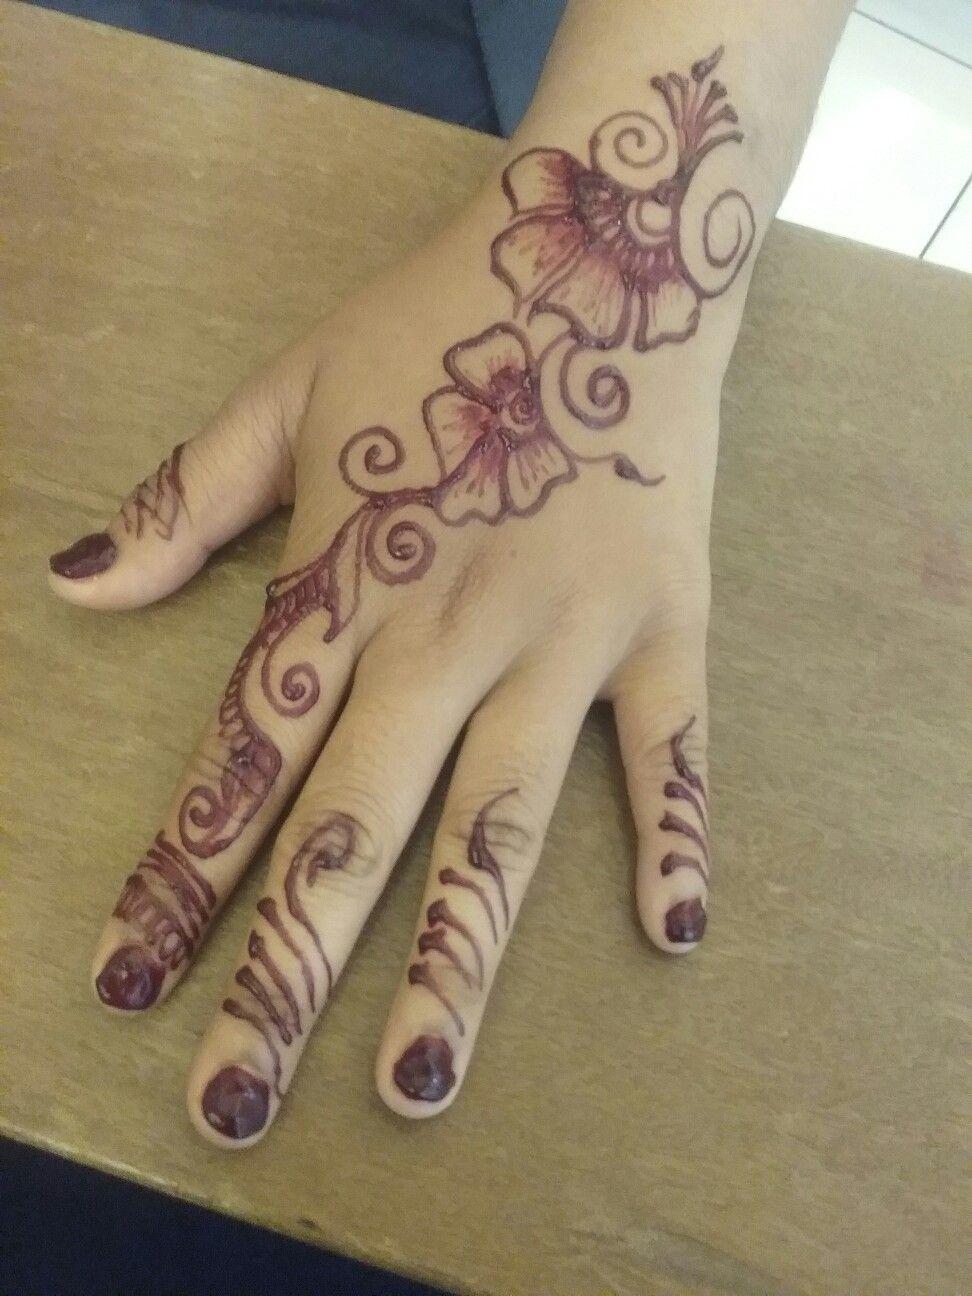 Henna Art By Inai Melingkar Malaysia Henna Art Henna Artist Henna